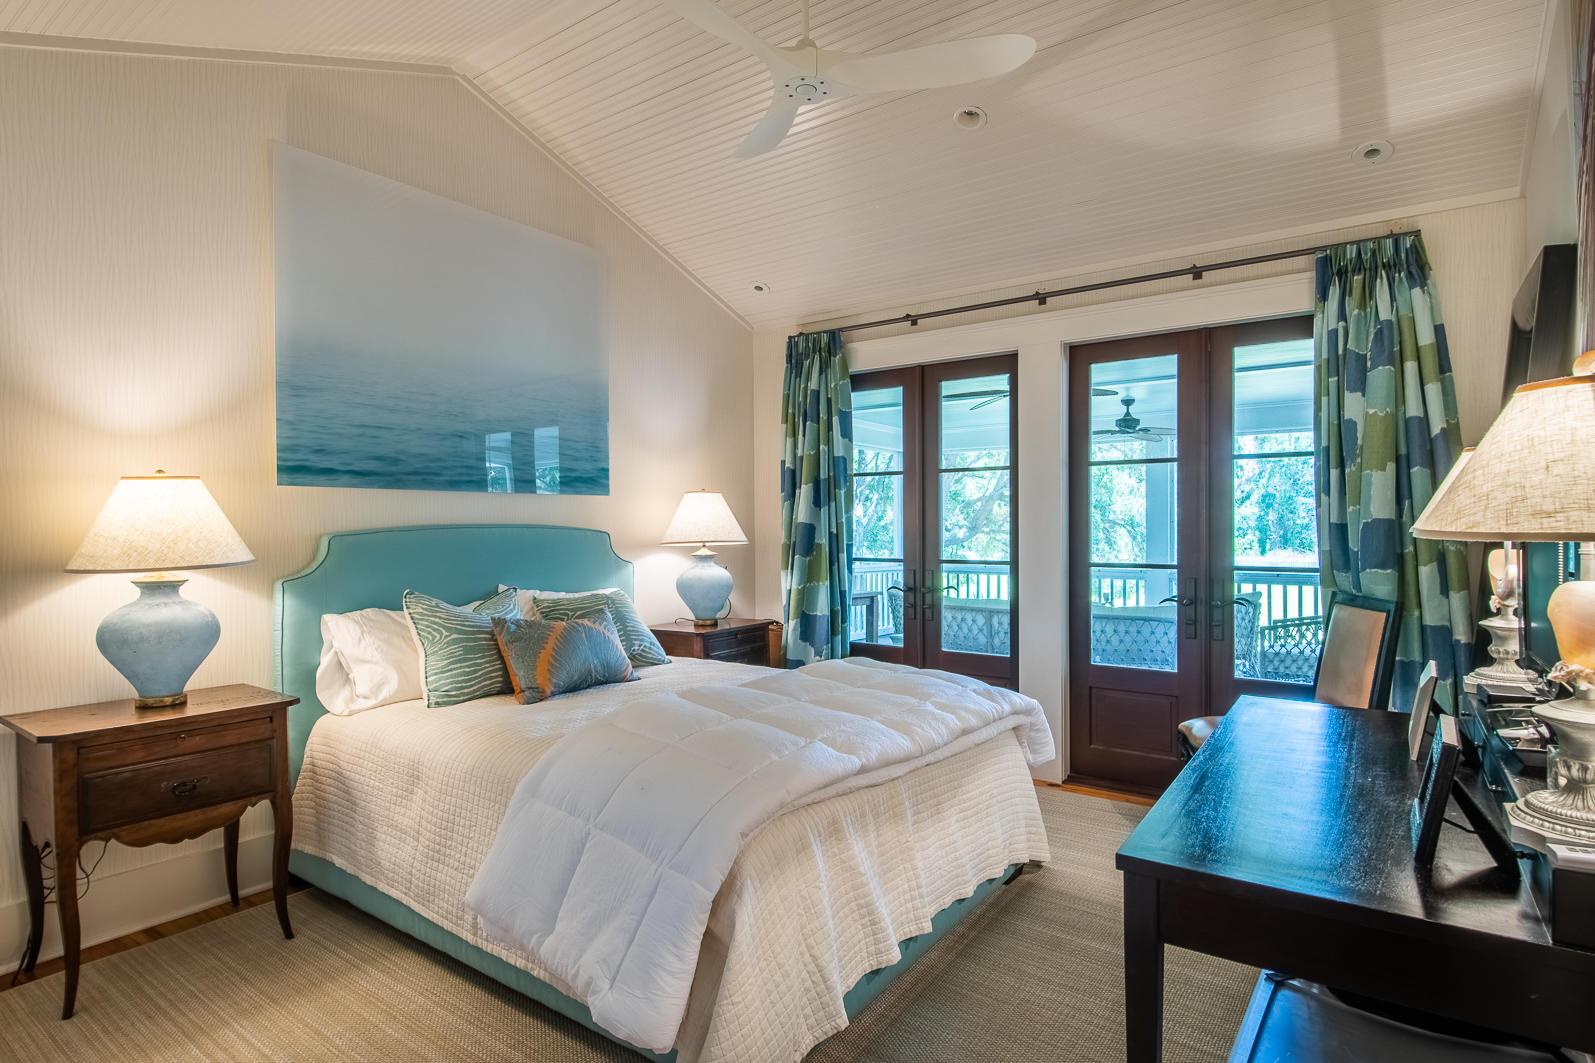 1773 Atlantic Avenue, Sullivans Island, 29482, 4 Bedrooms Bedrooms, ,4 BathroomsBathrooms,Residential,For Sale,Atlantic,21022287